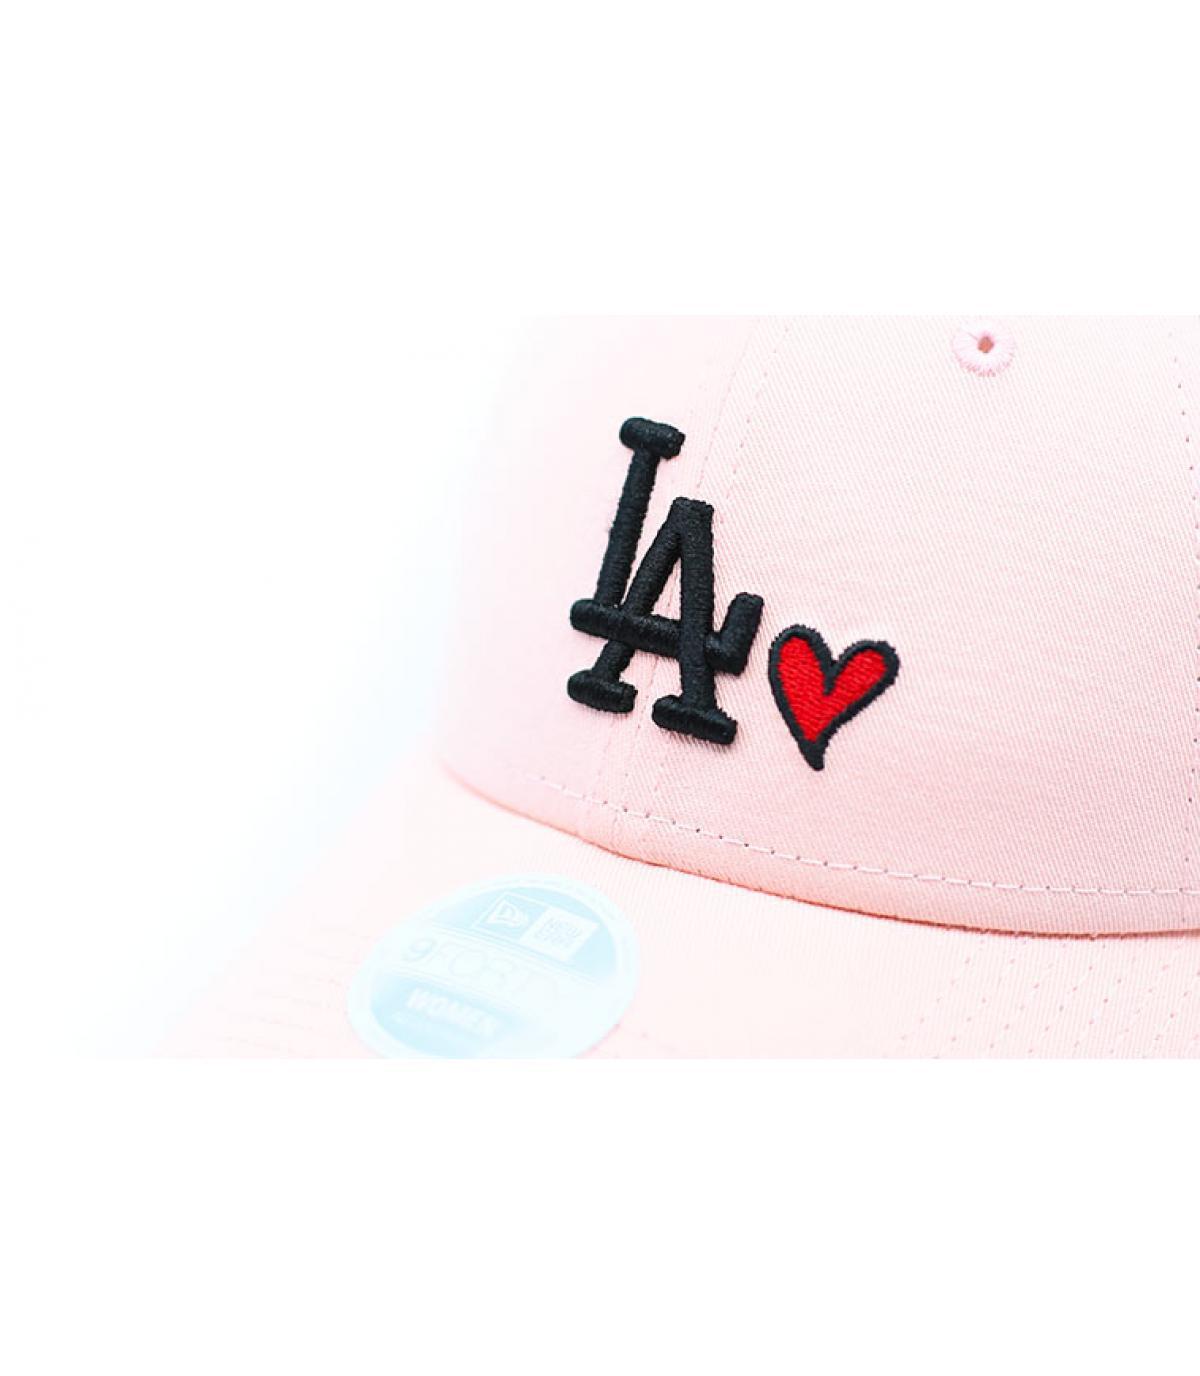 Dettagli Casquette Wmns Heart LA 940 pink - image 3